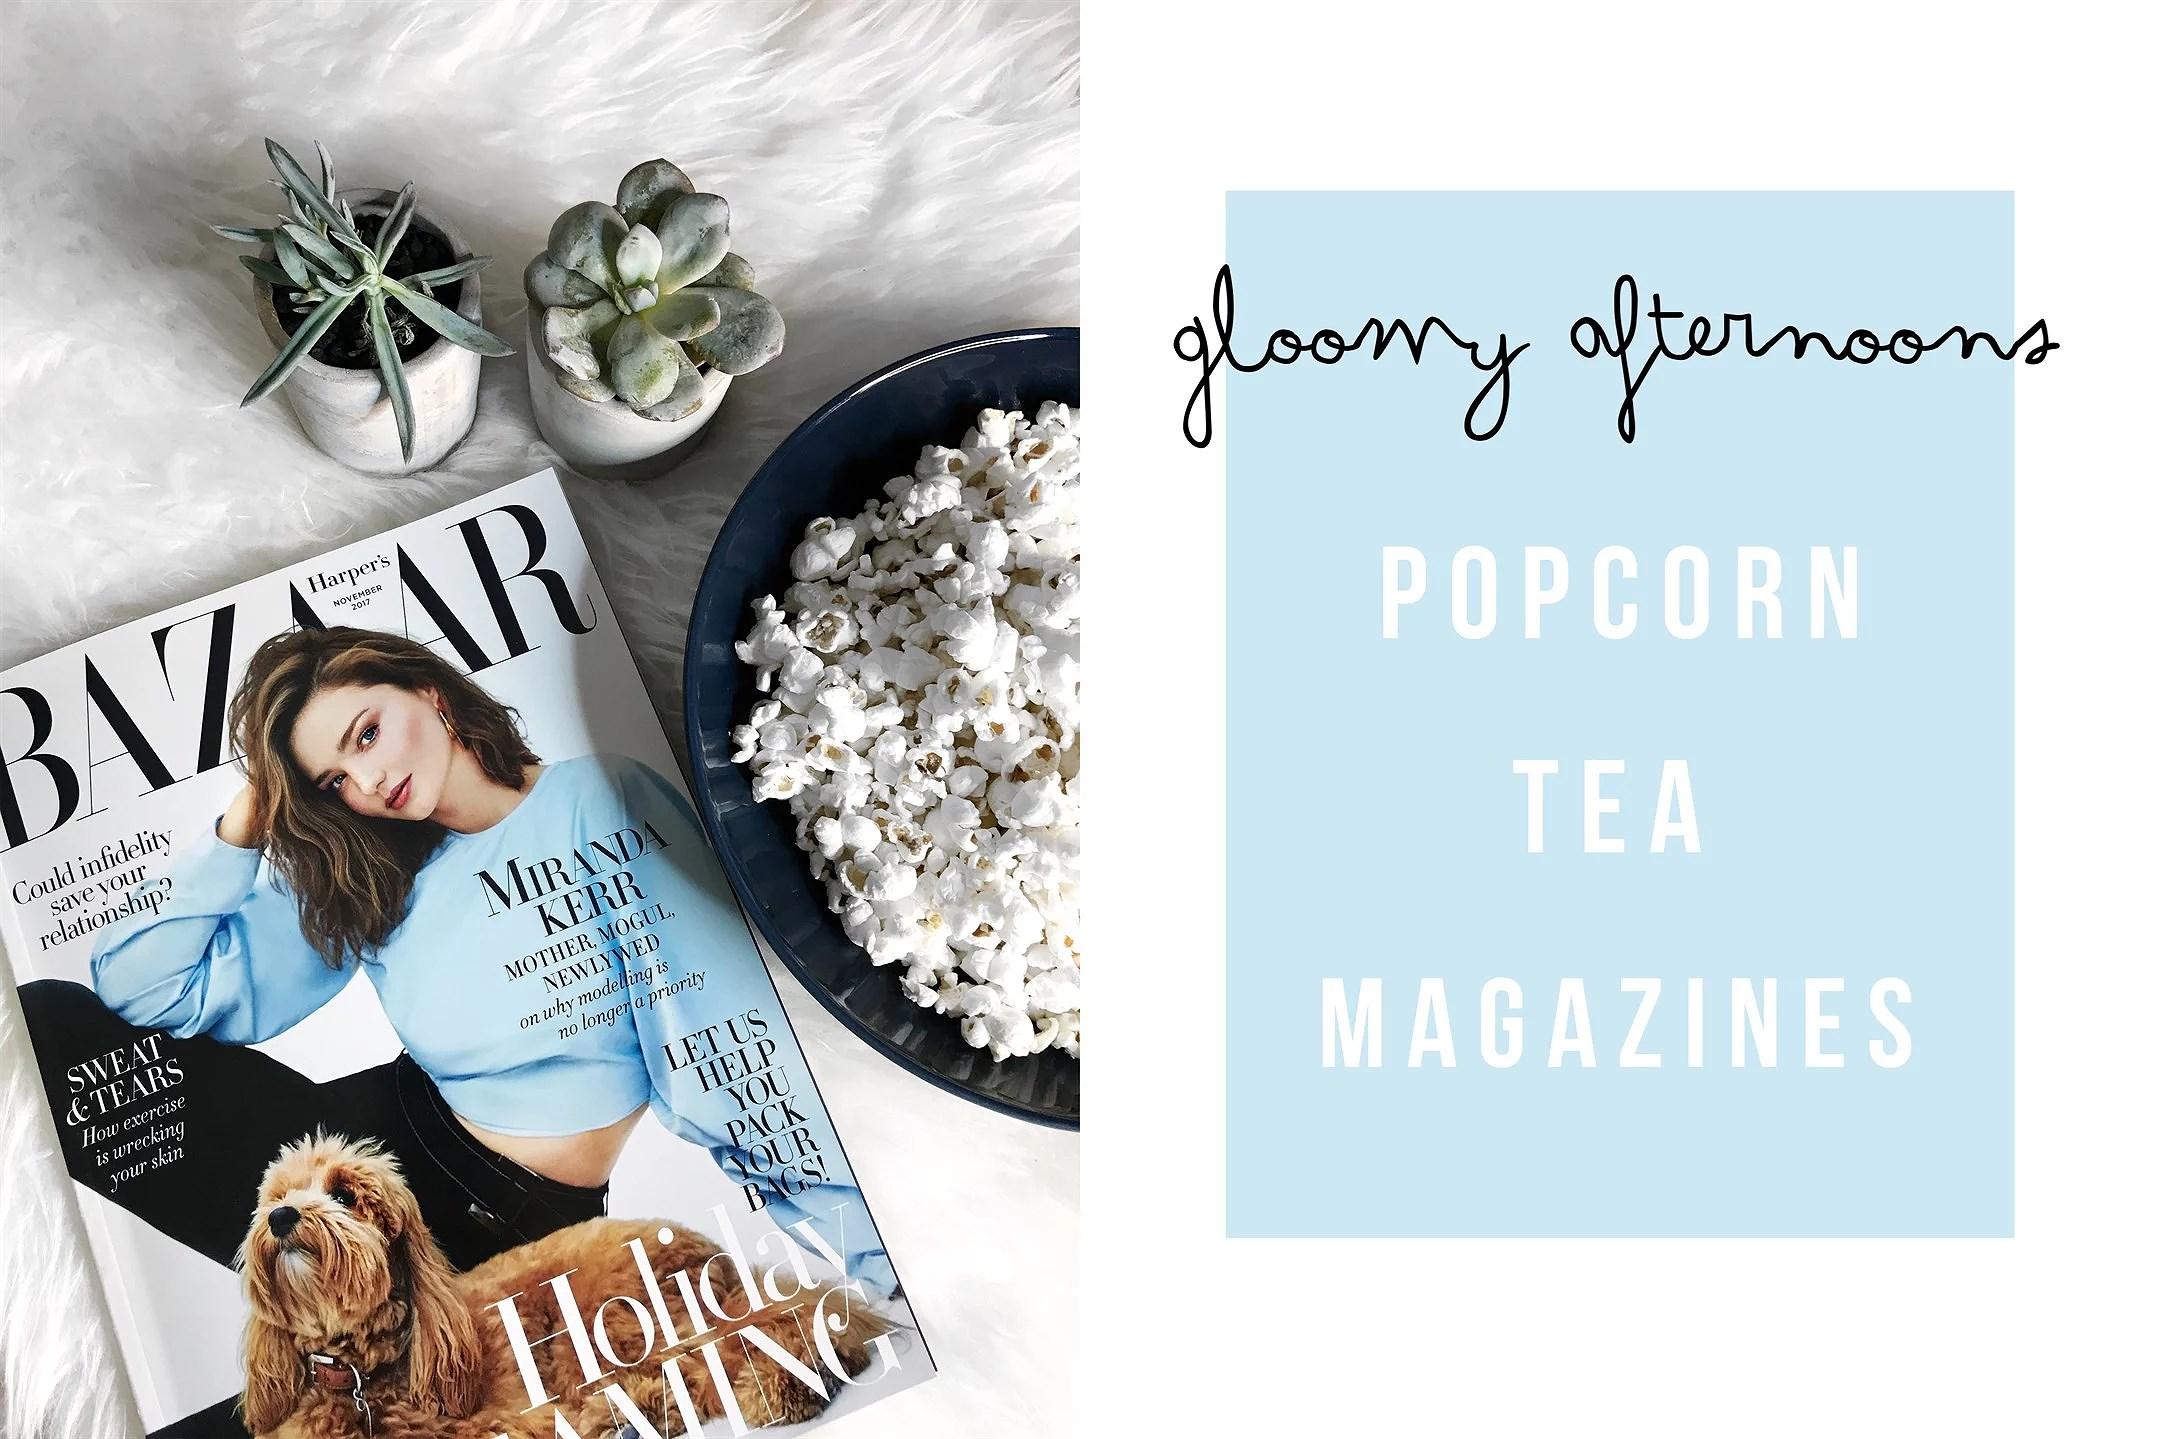 POPCORN, TEA & MAGAZINES